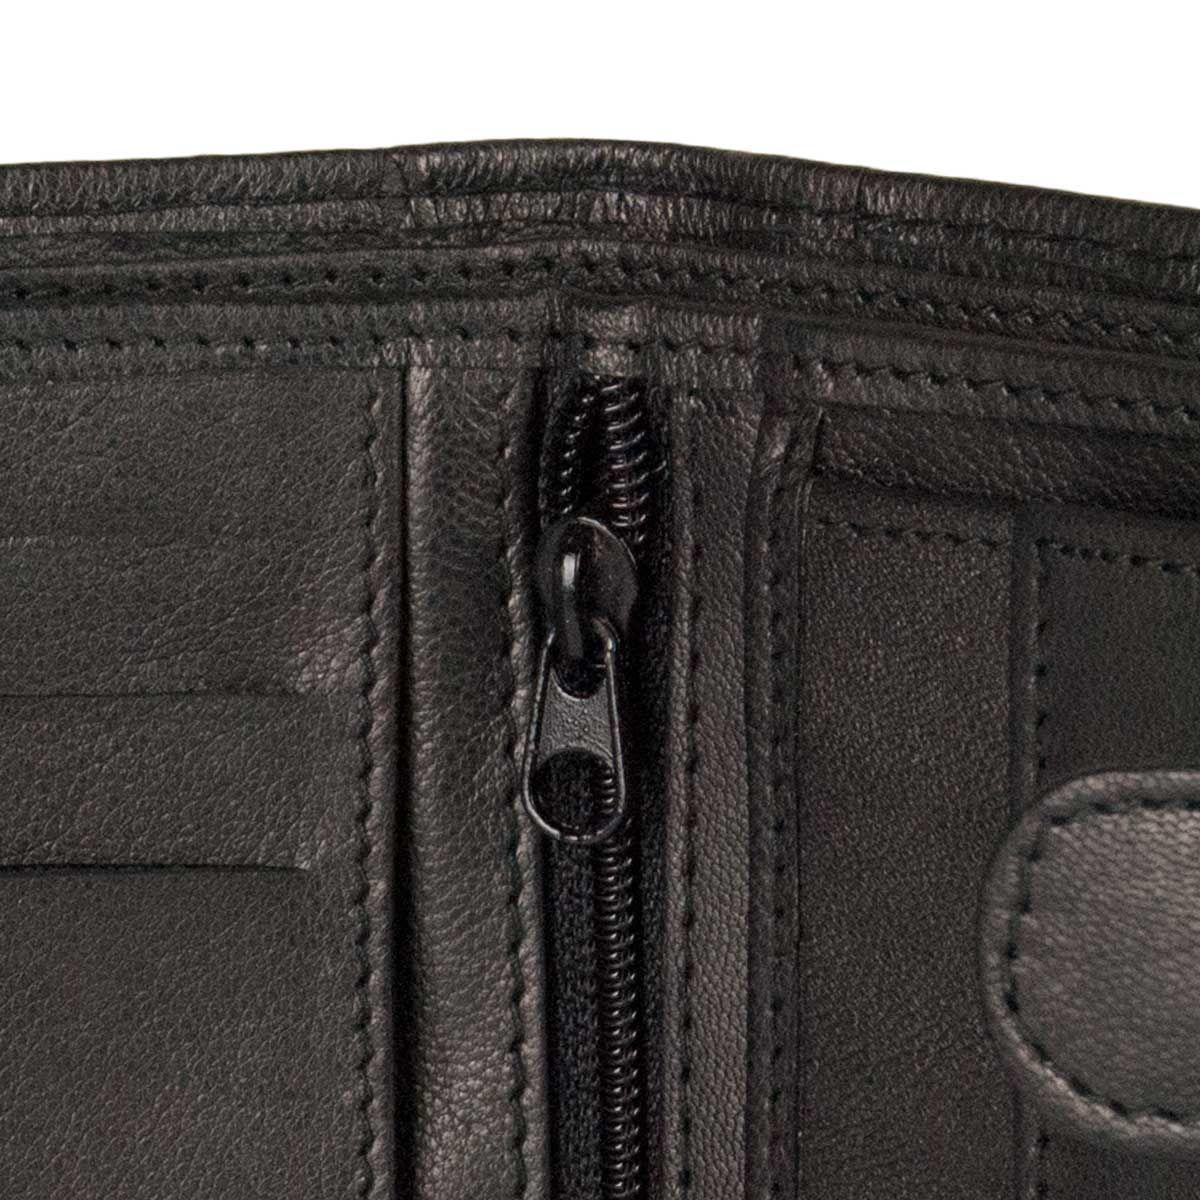 Montevita Leather Wallet in Black